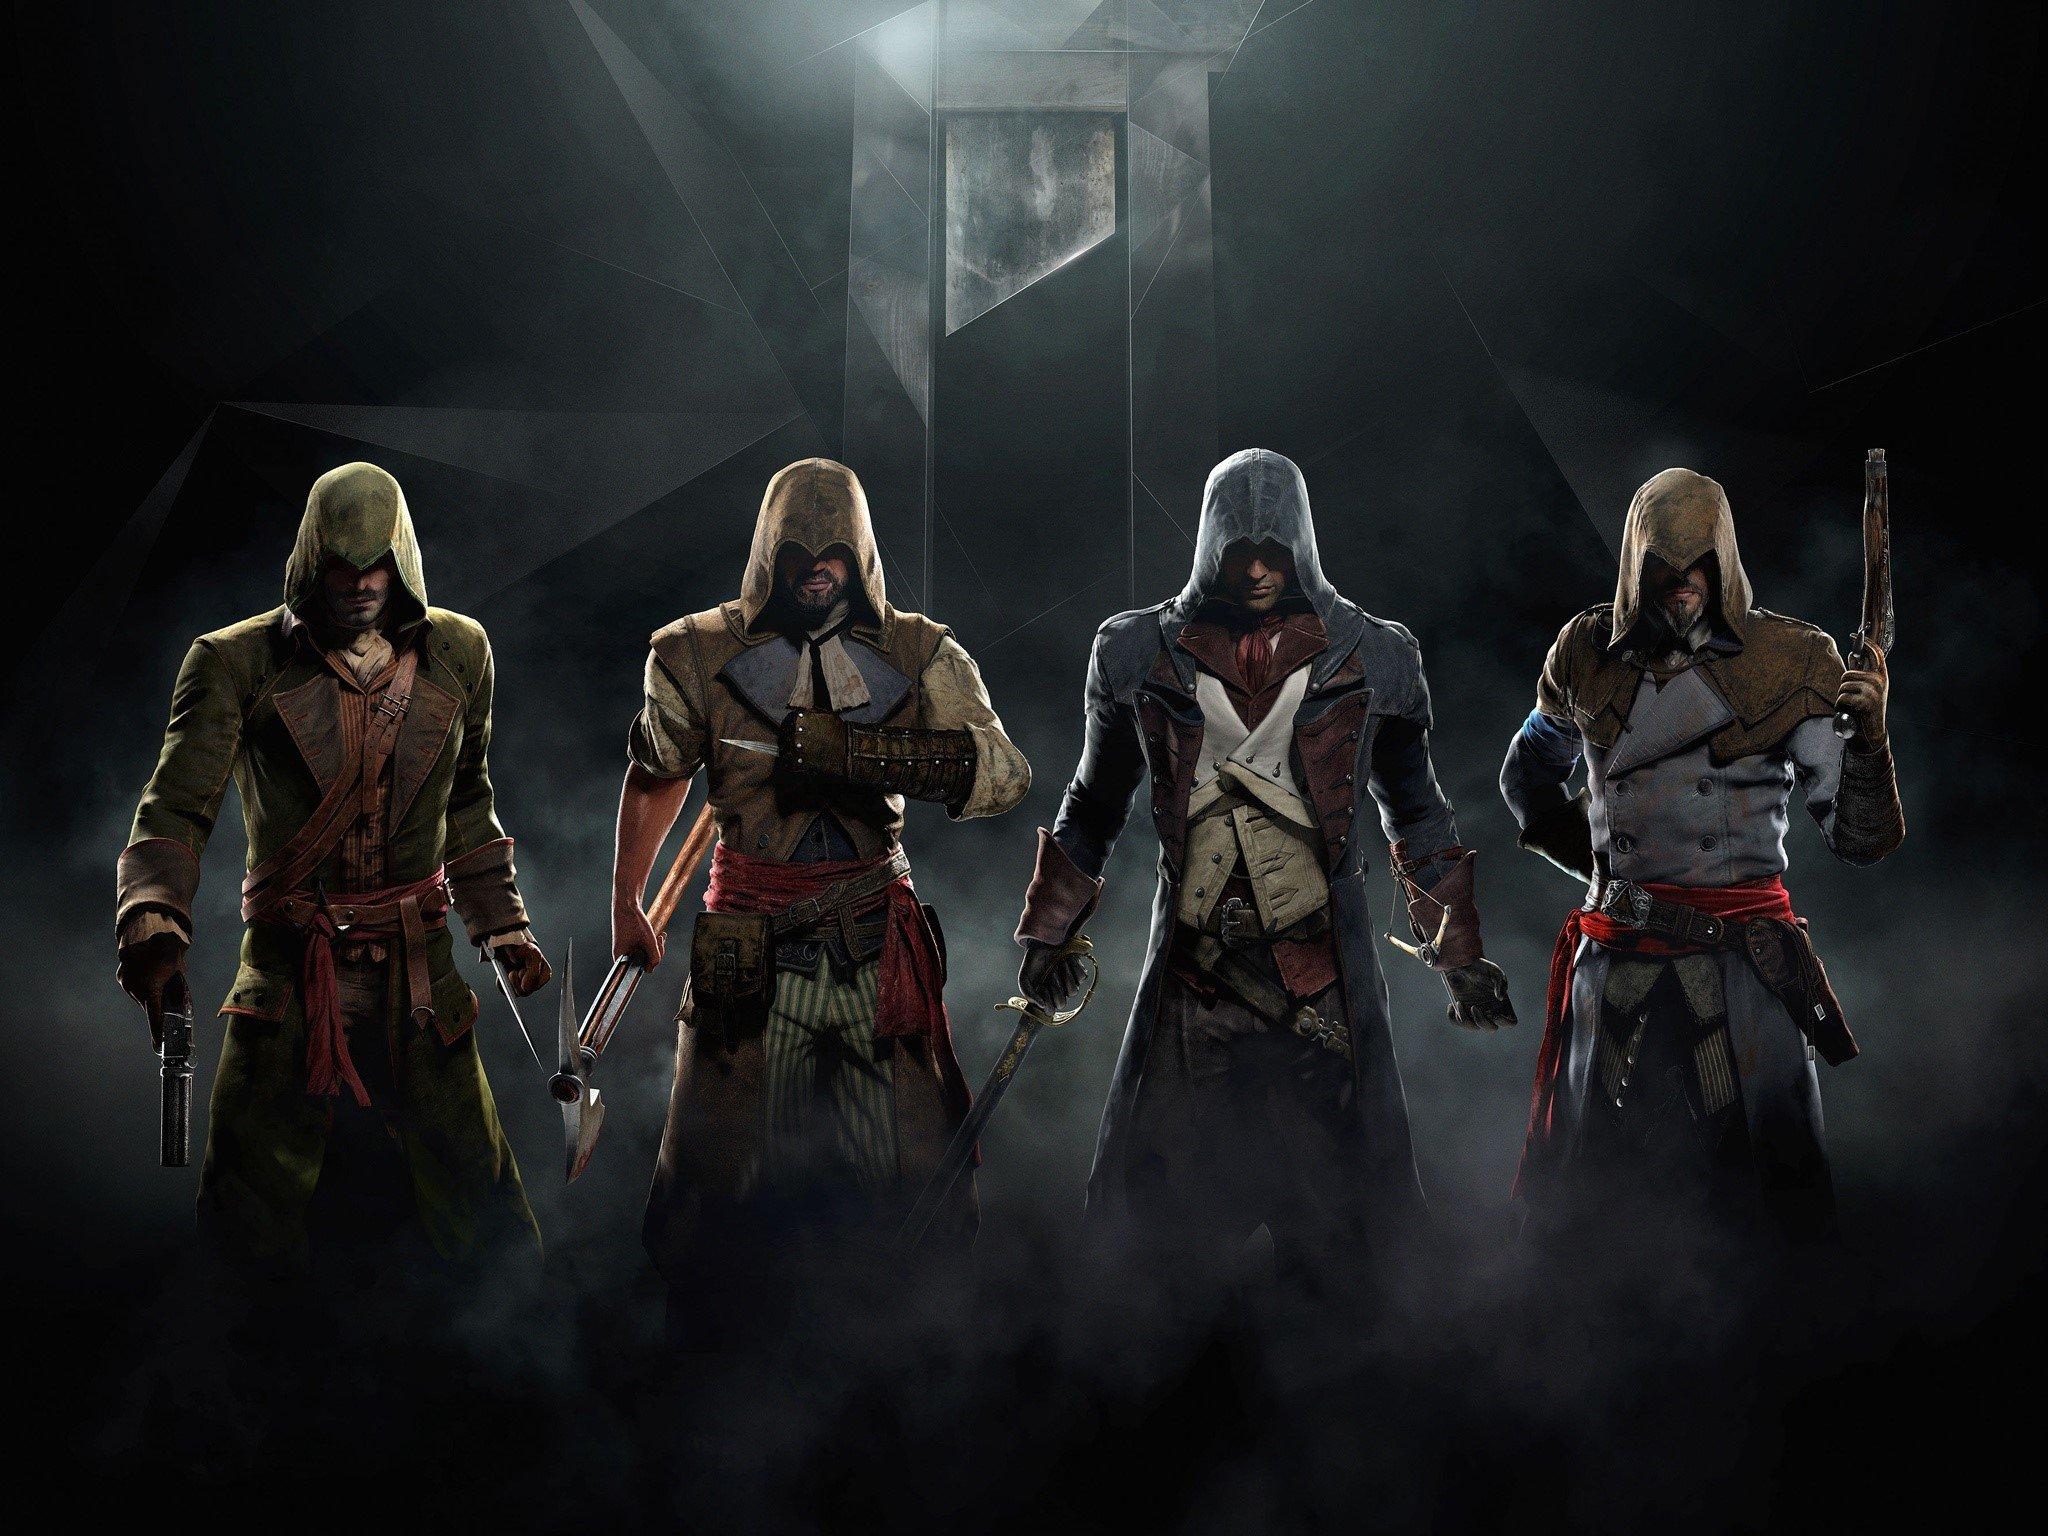 Fondos de pantalla Assassins Creed Unity Juego